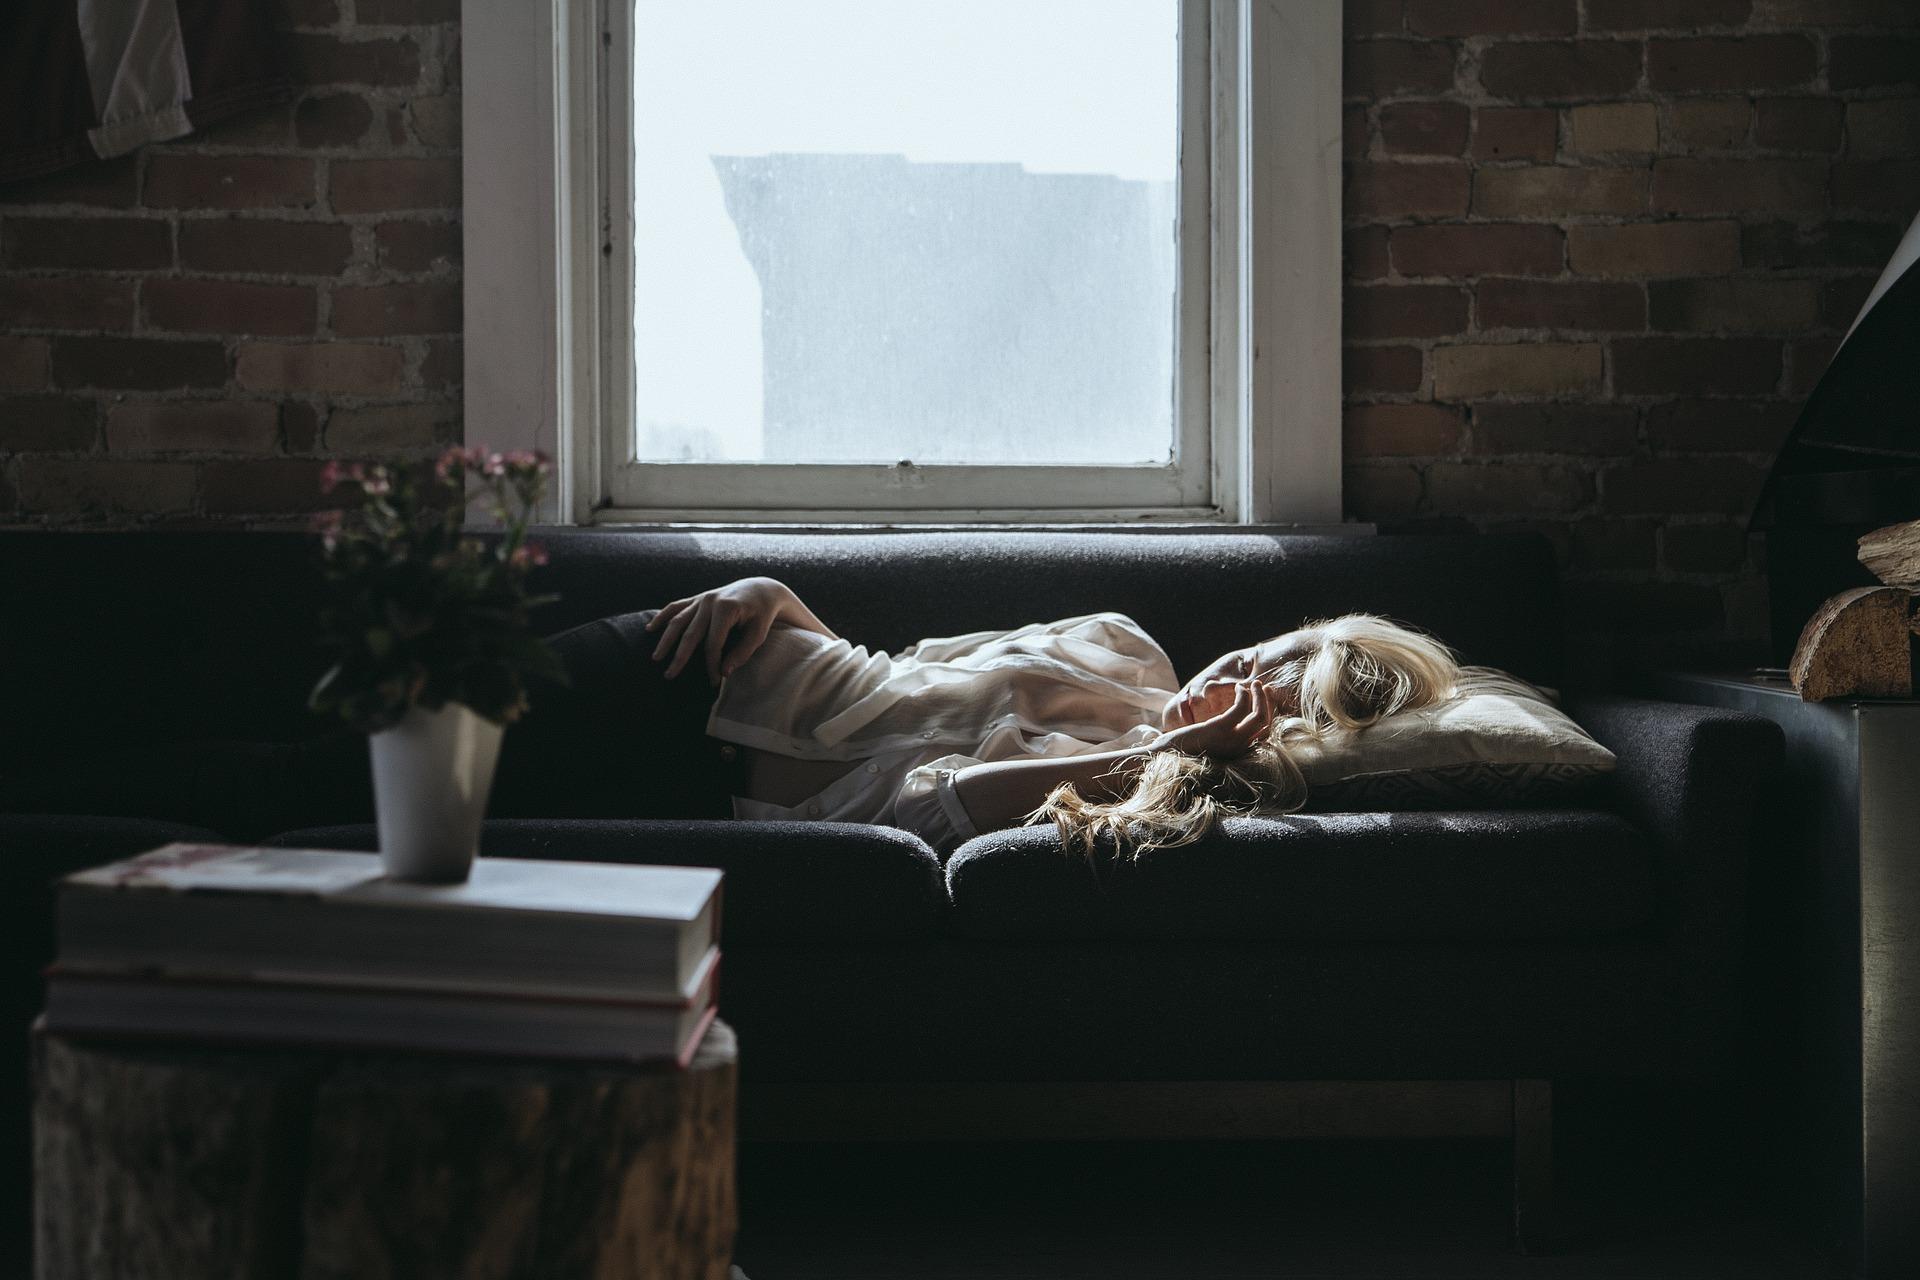 A woman fast asleep on the sofa.